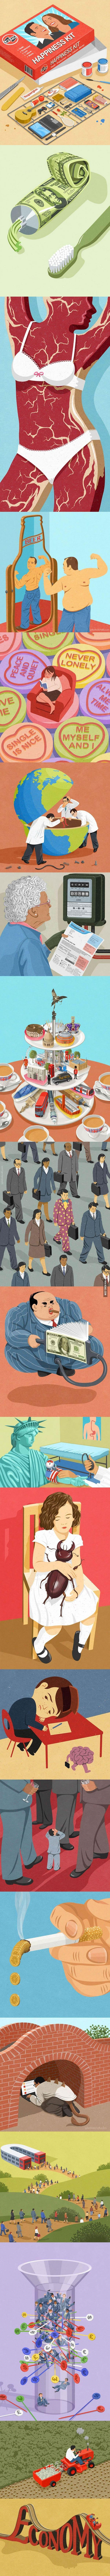 Satirical Illustrations by John Holcrof